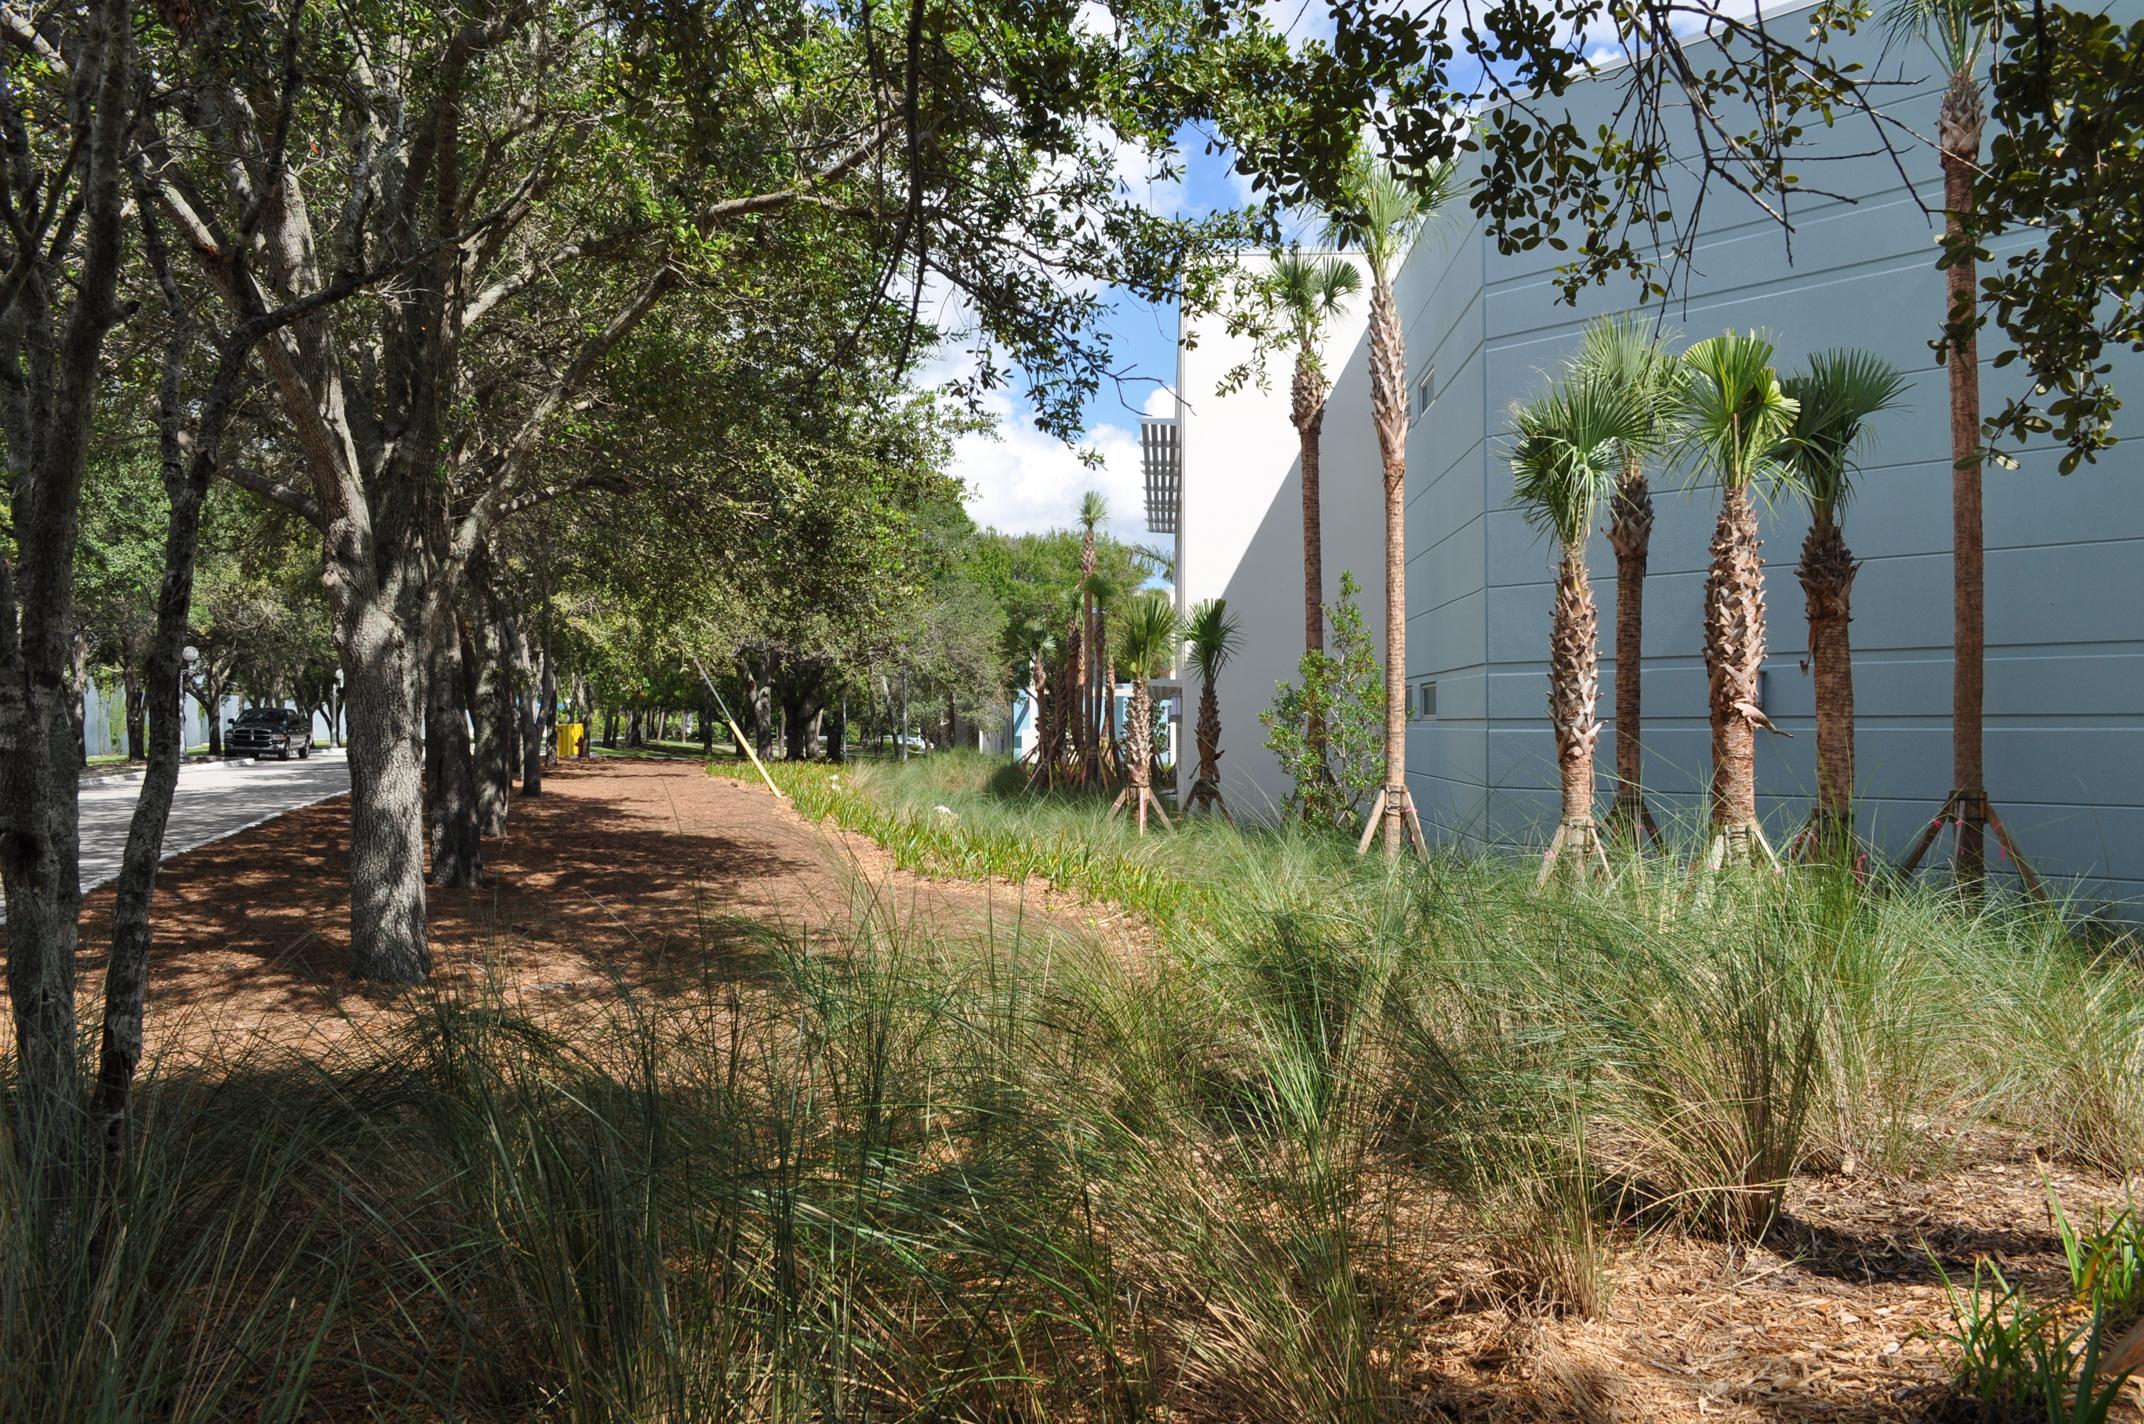 Harbor Branch Oceanographic Institute at FAU Research Laboratory II Bio Swale Native Plantings.JPG